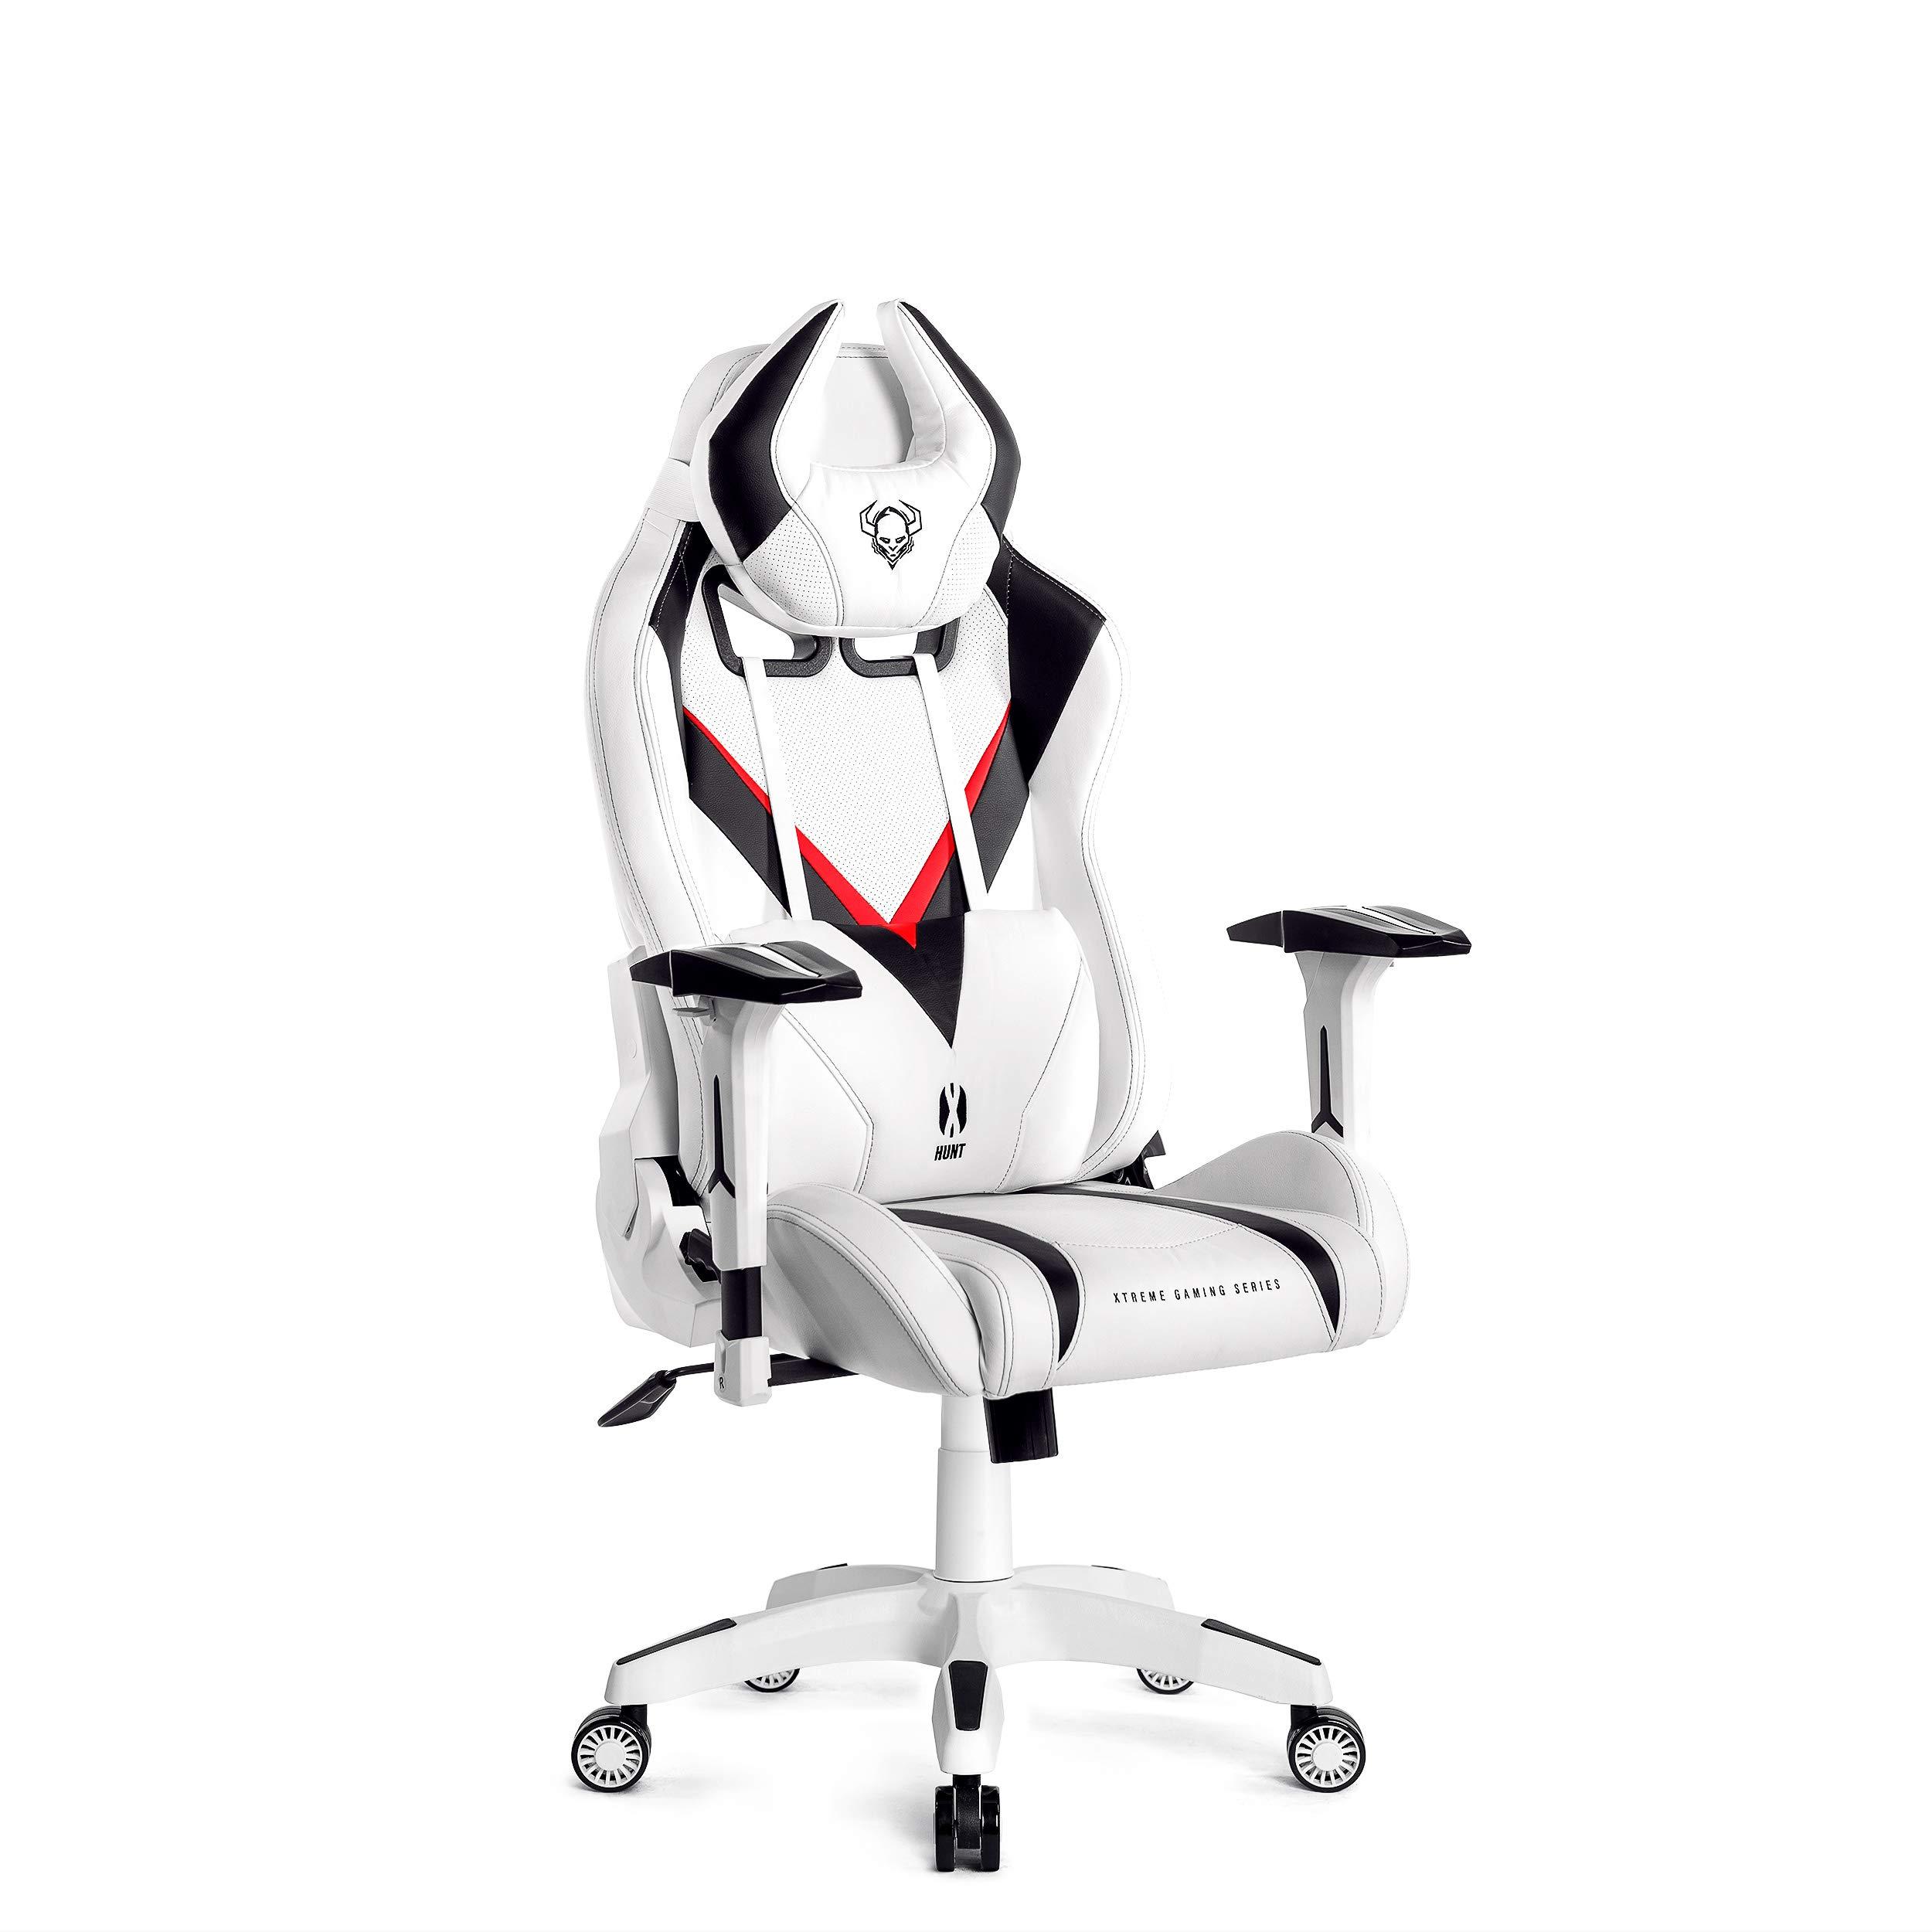 Diablo X-Hunt Silla Gaming Silla de Oficina diseño ergonomico ...